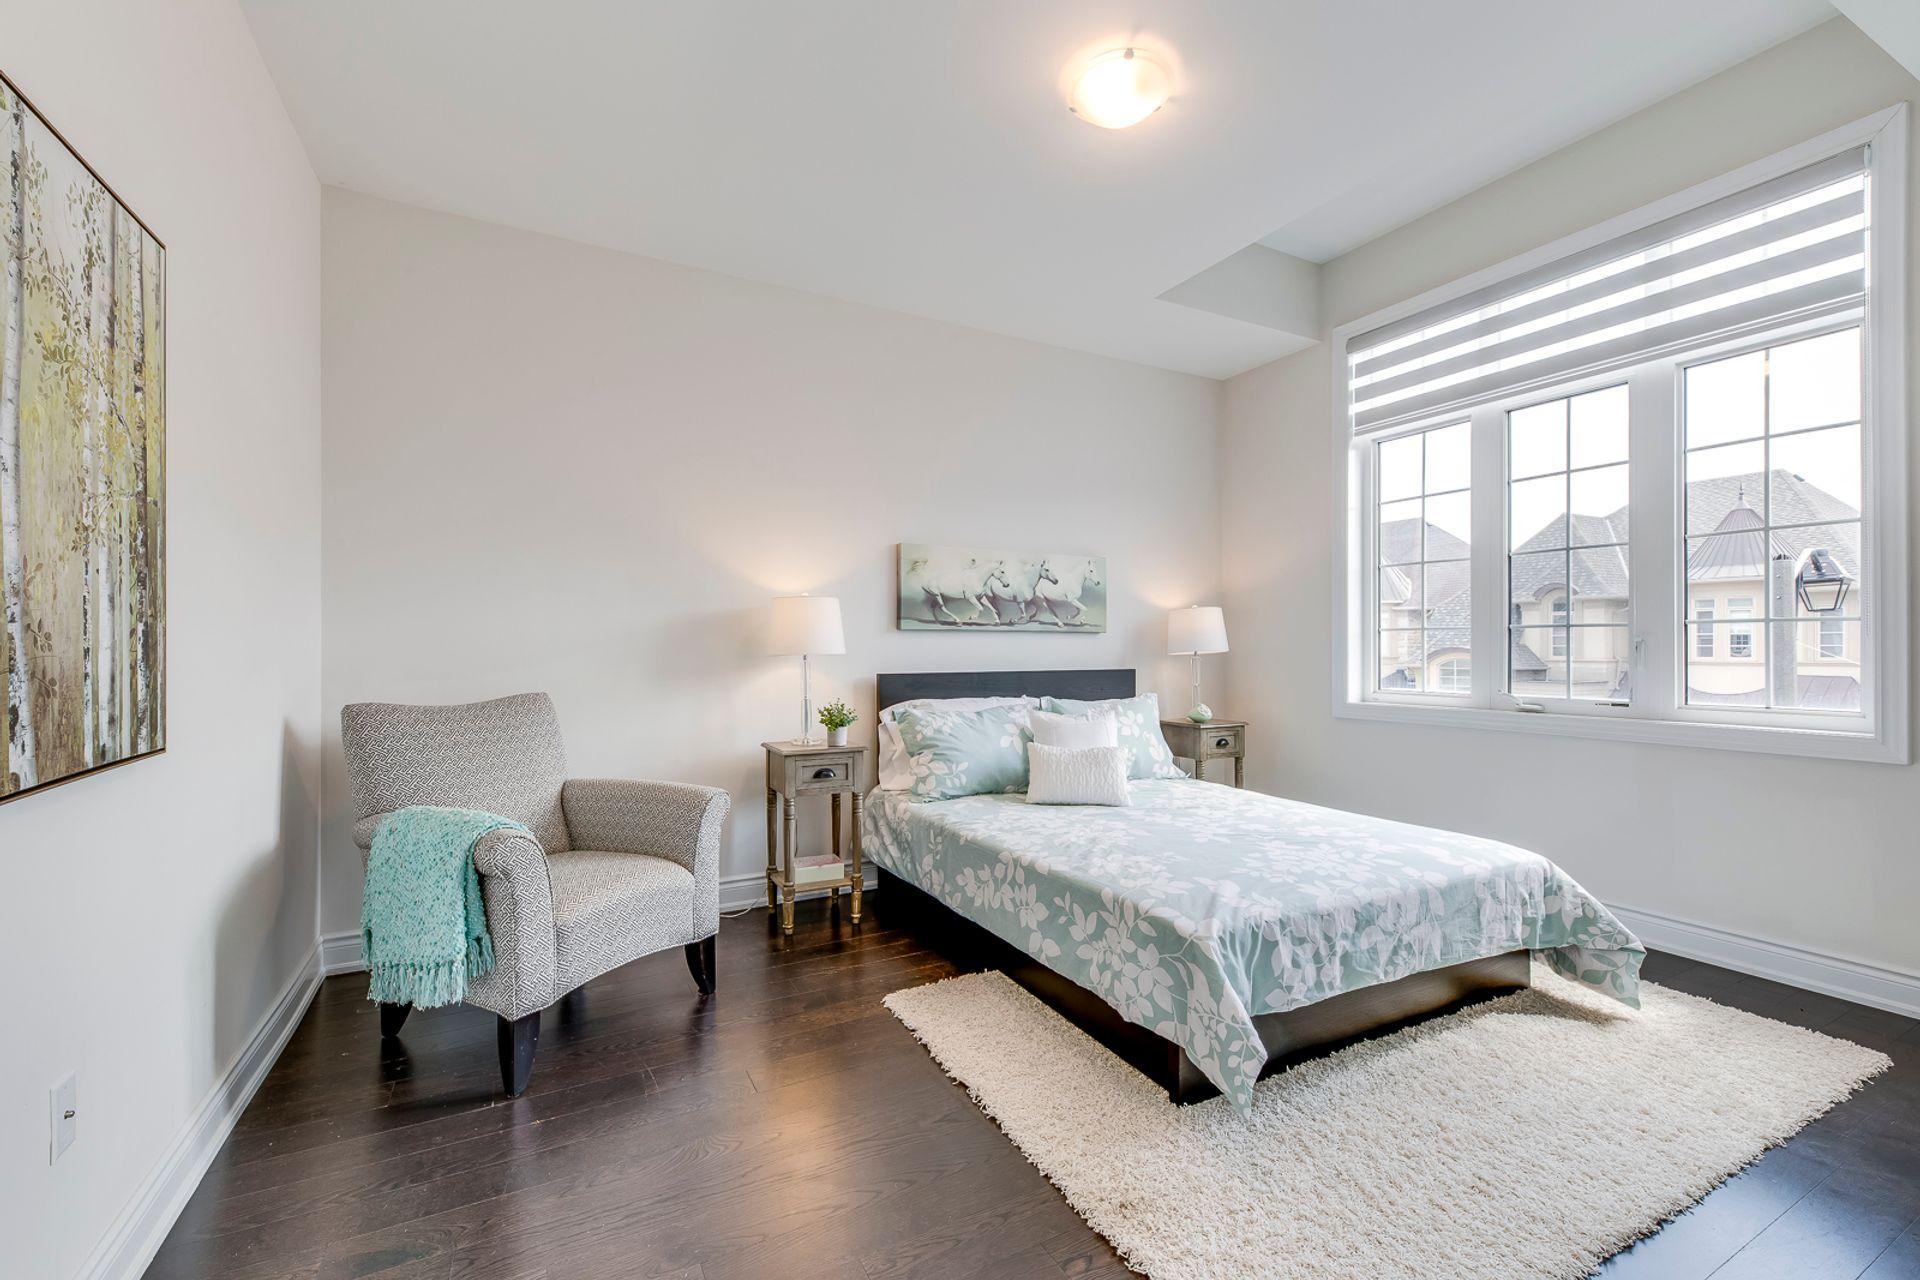 3rd Bedroom - 3048 Parsonage Cres, Oakville - Elite3 & Team at 3048 Parsonage Crescent, Rural Oakville, Oakville